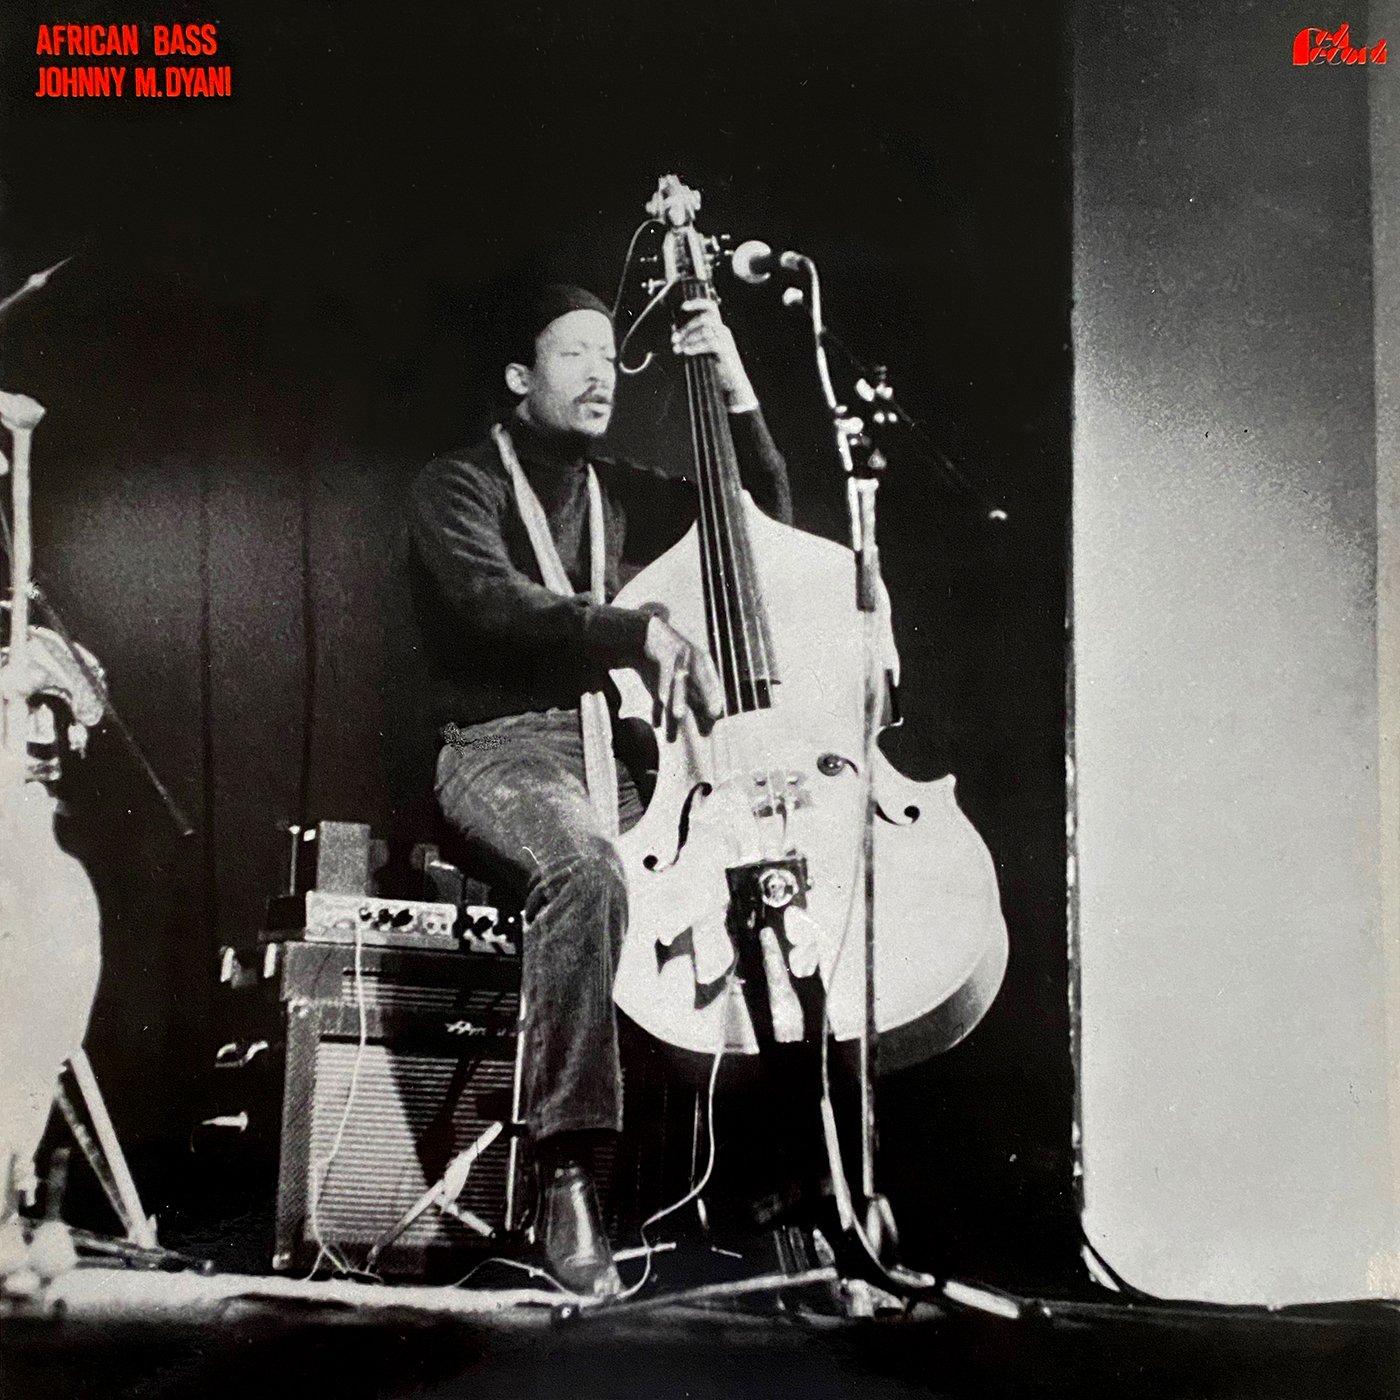 African Bass - Johnny M. Dyani